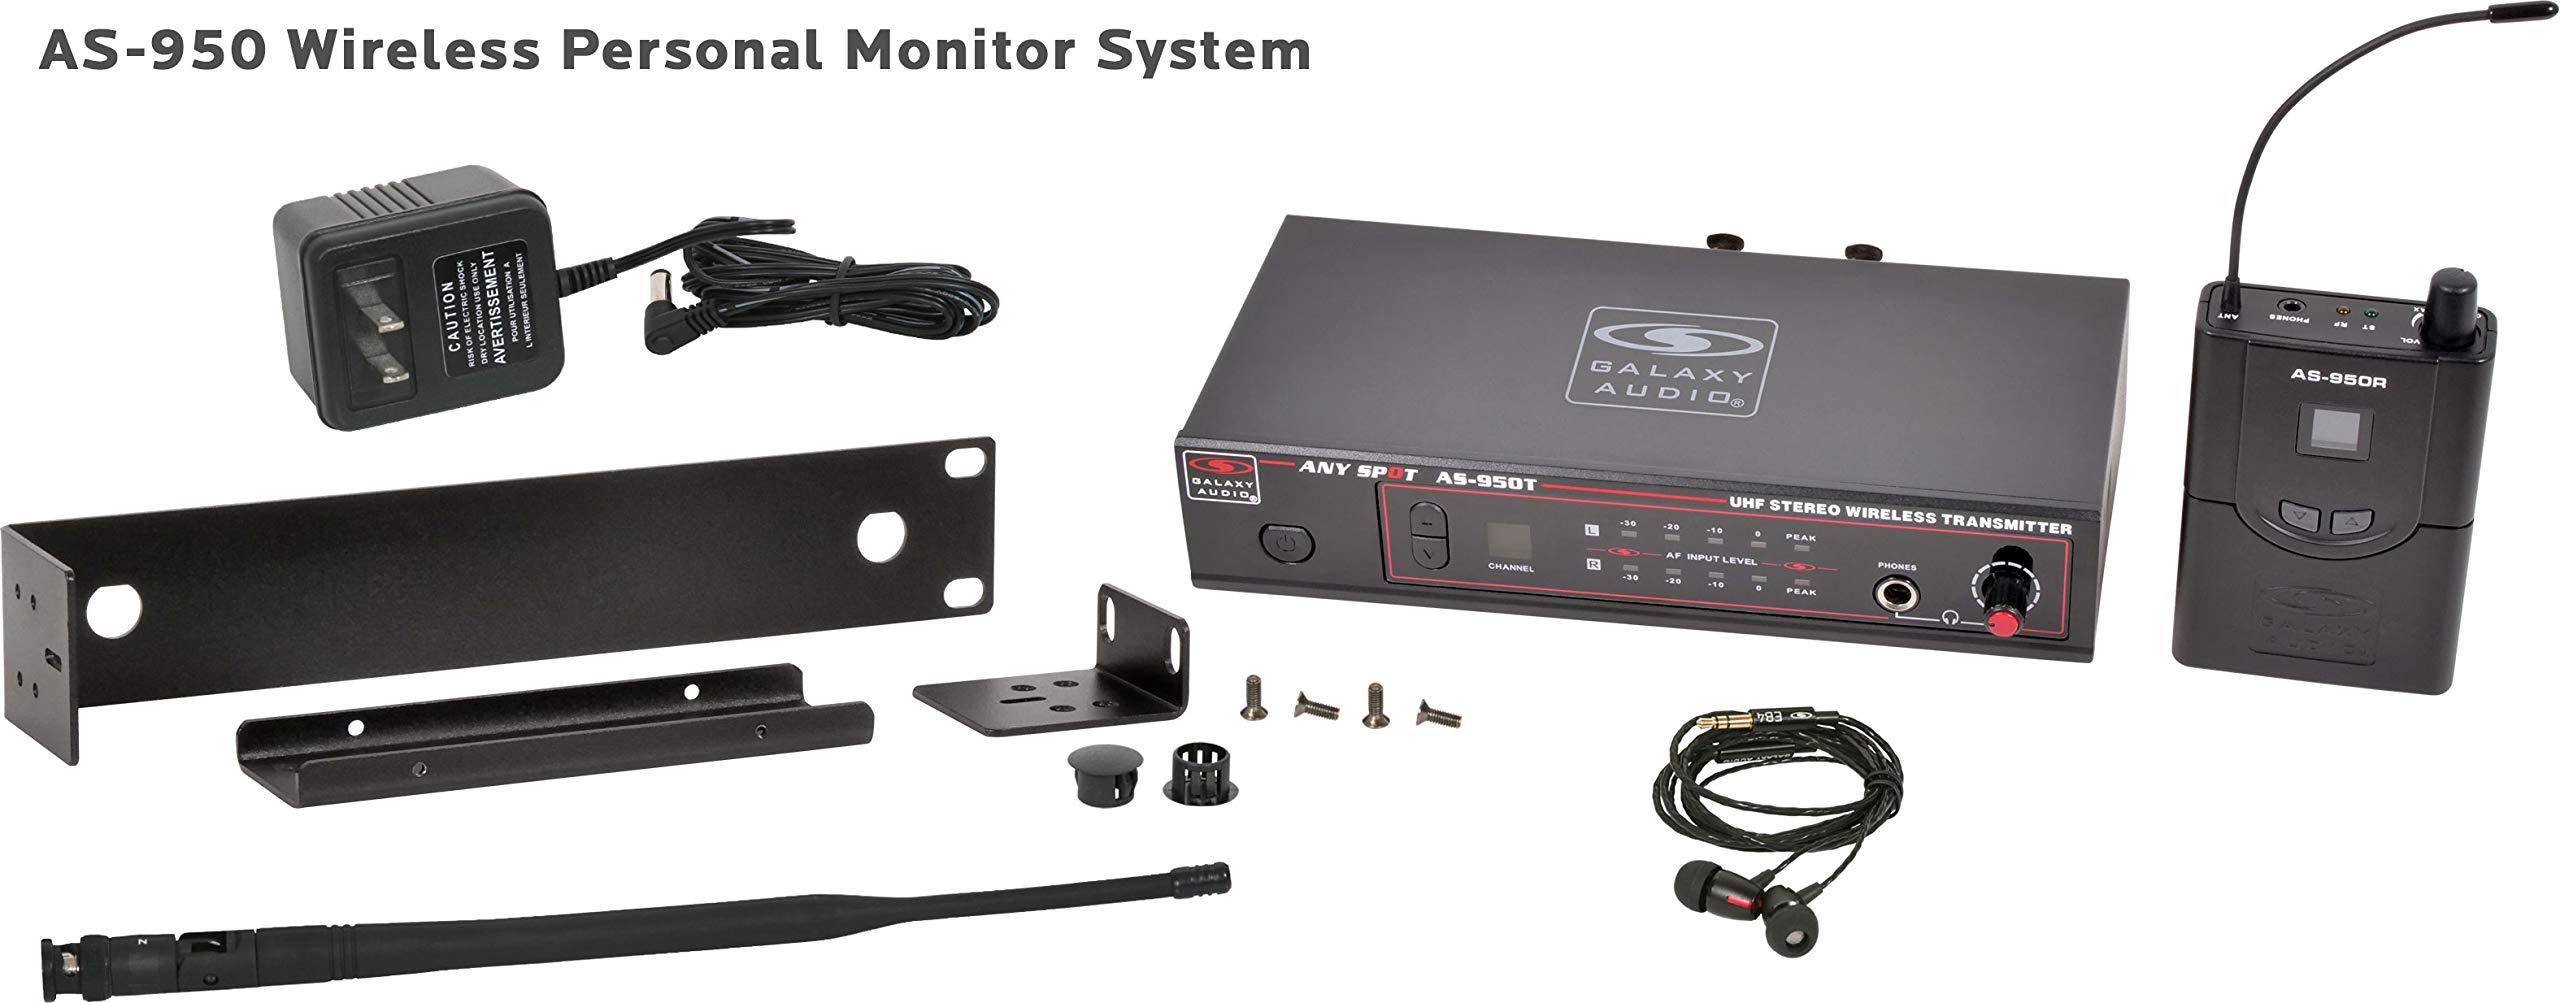 Galaxy Audio In- In-Ear Audio Monitor System (AS-950N)